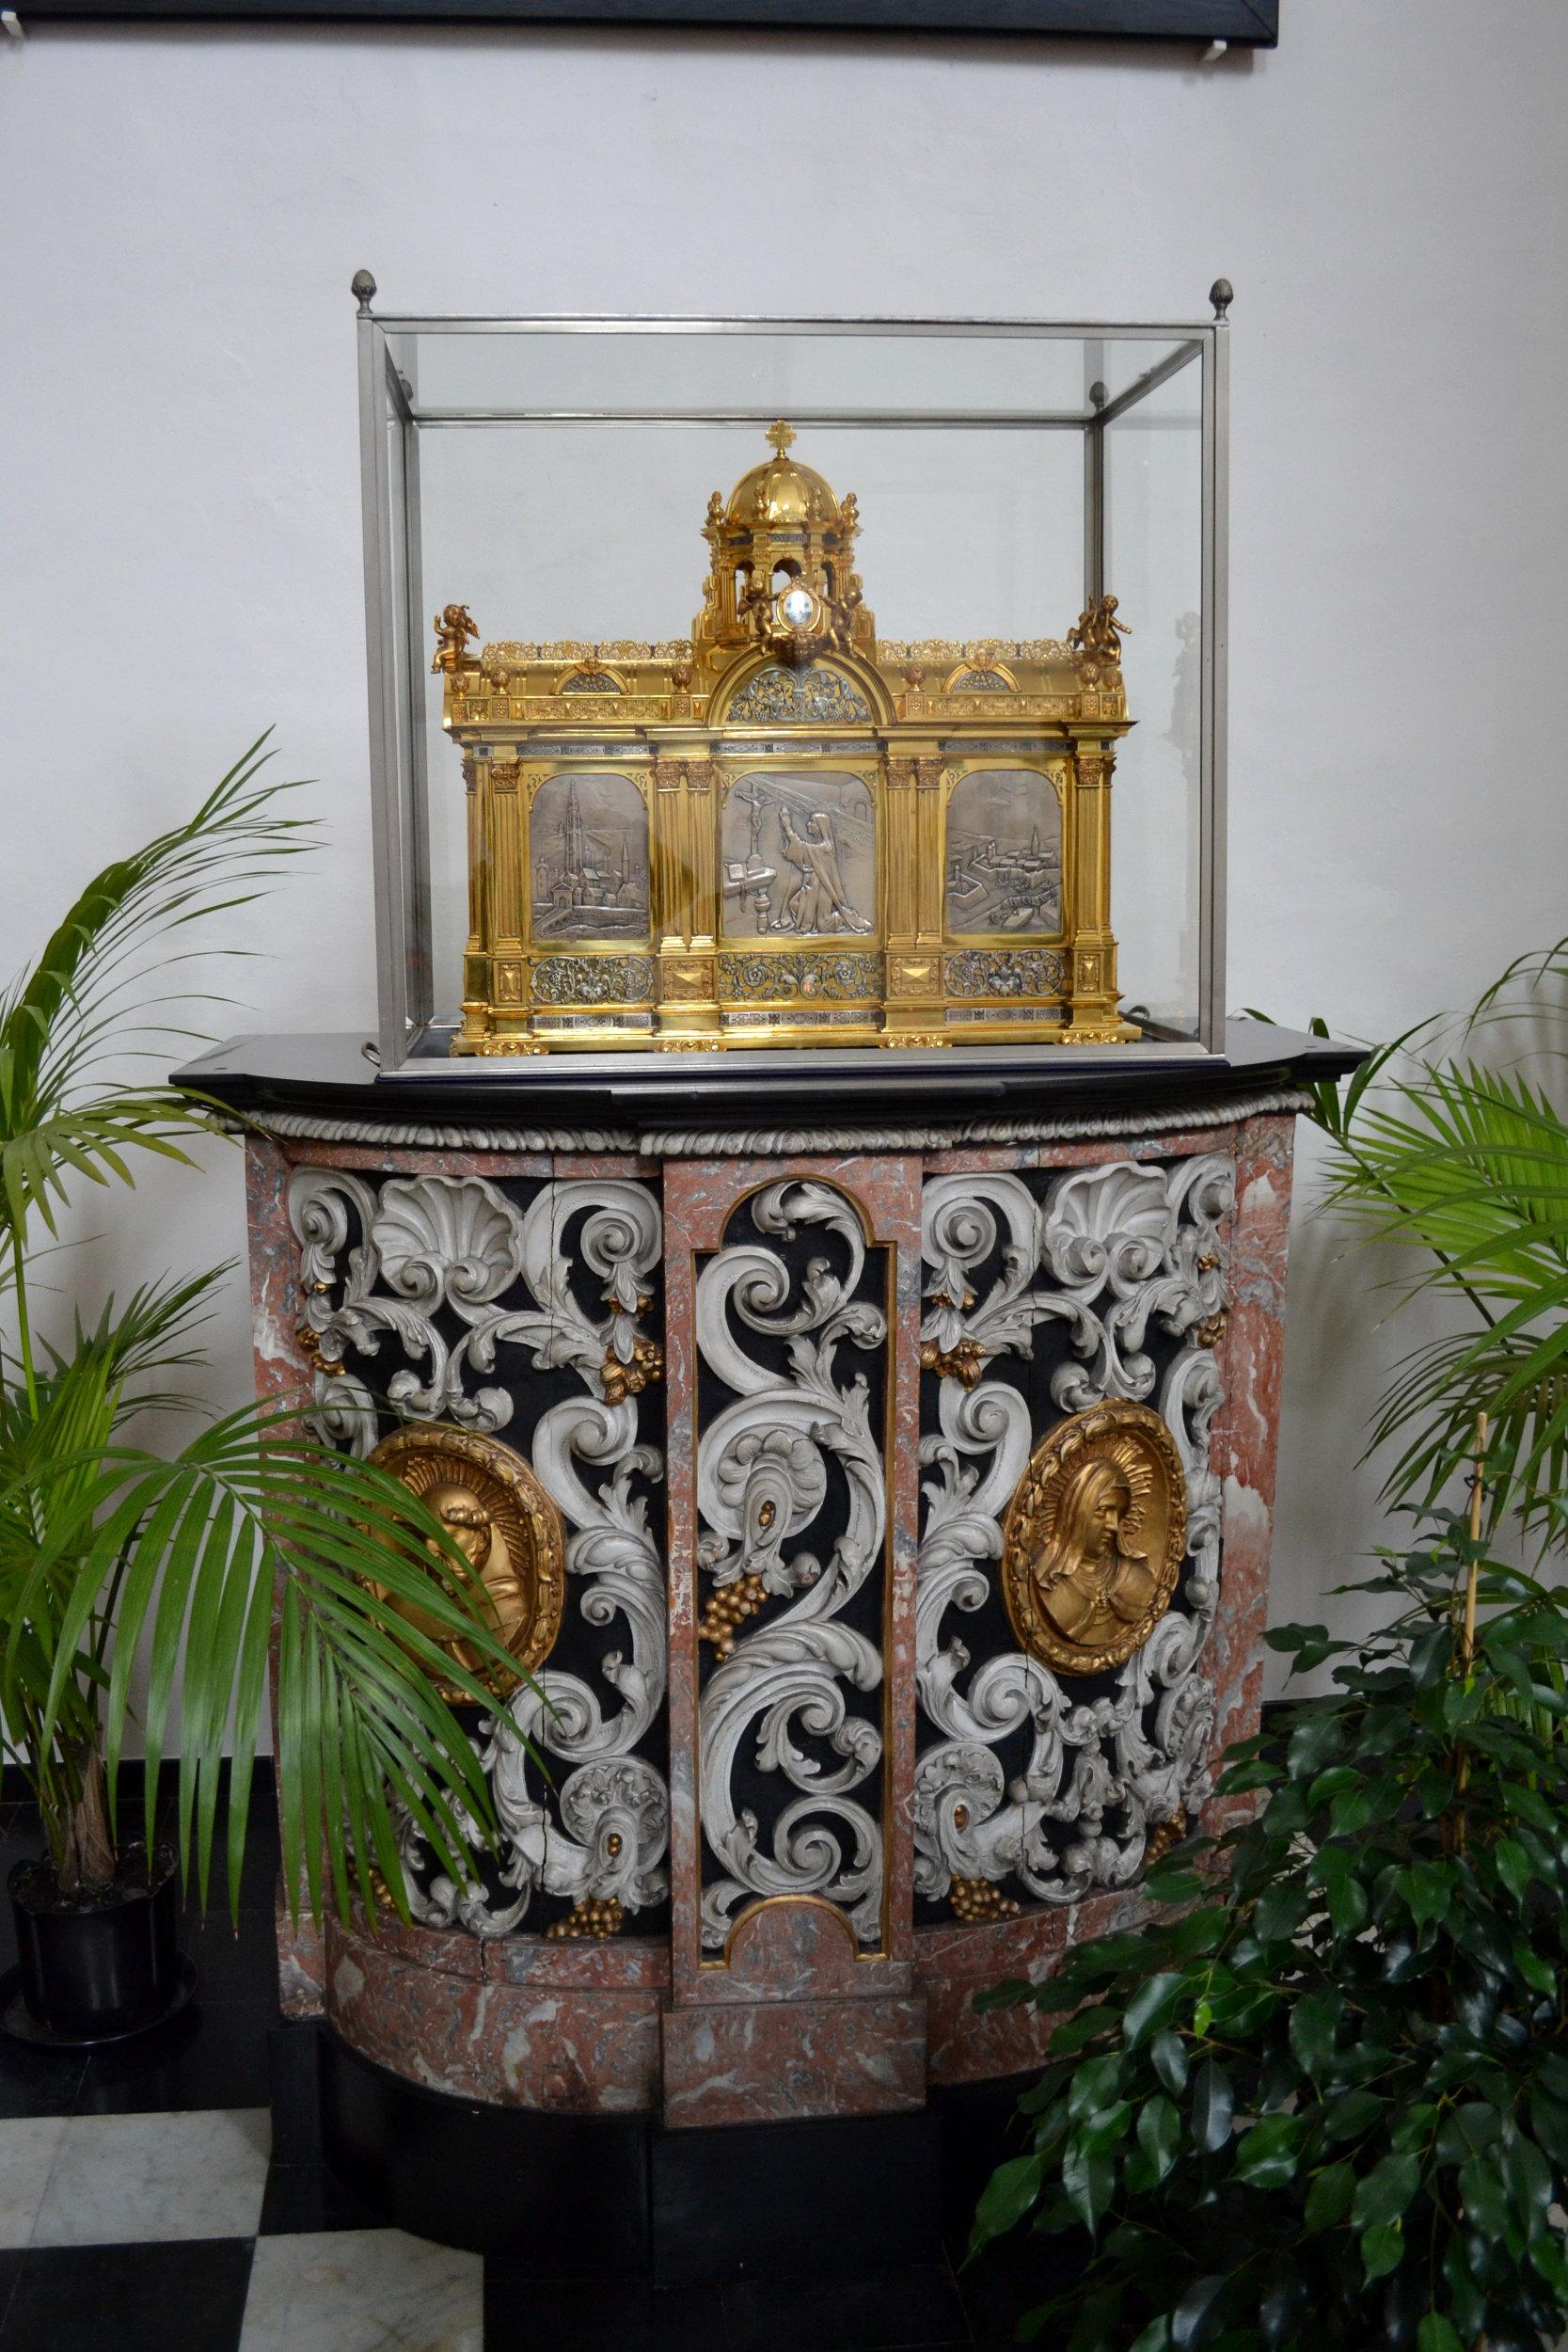 Karmelietessenklooster, Antwerp reliquary